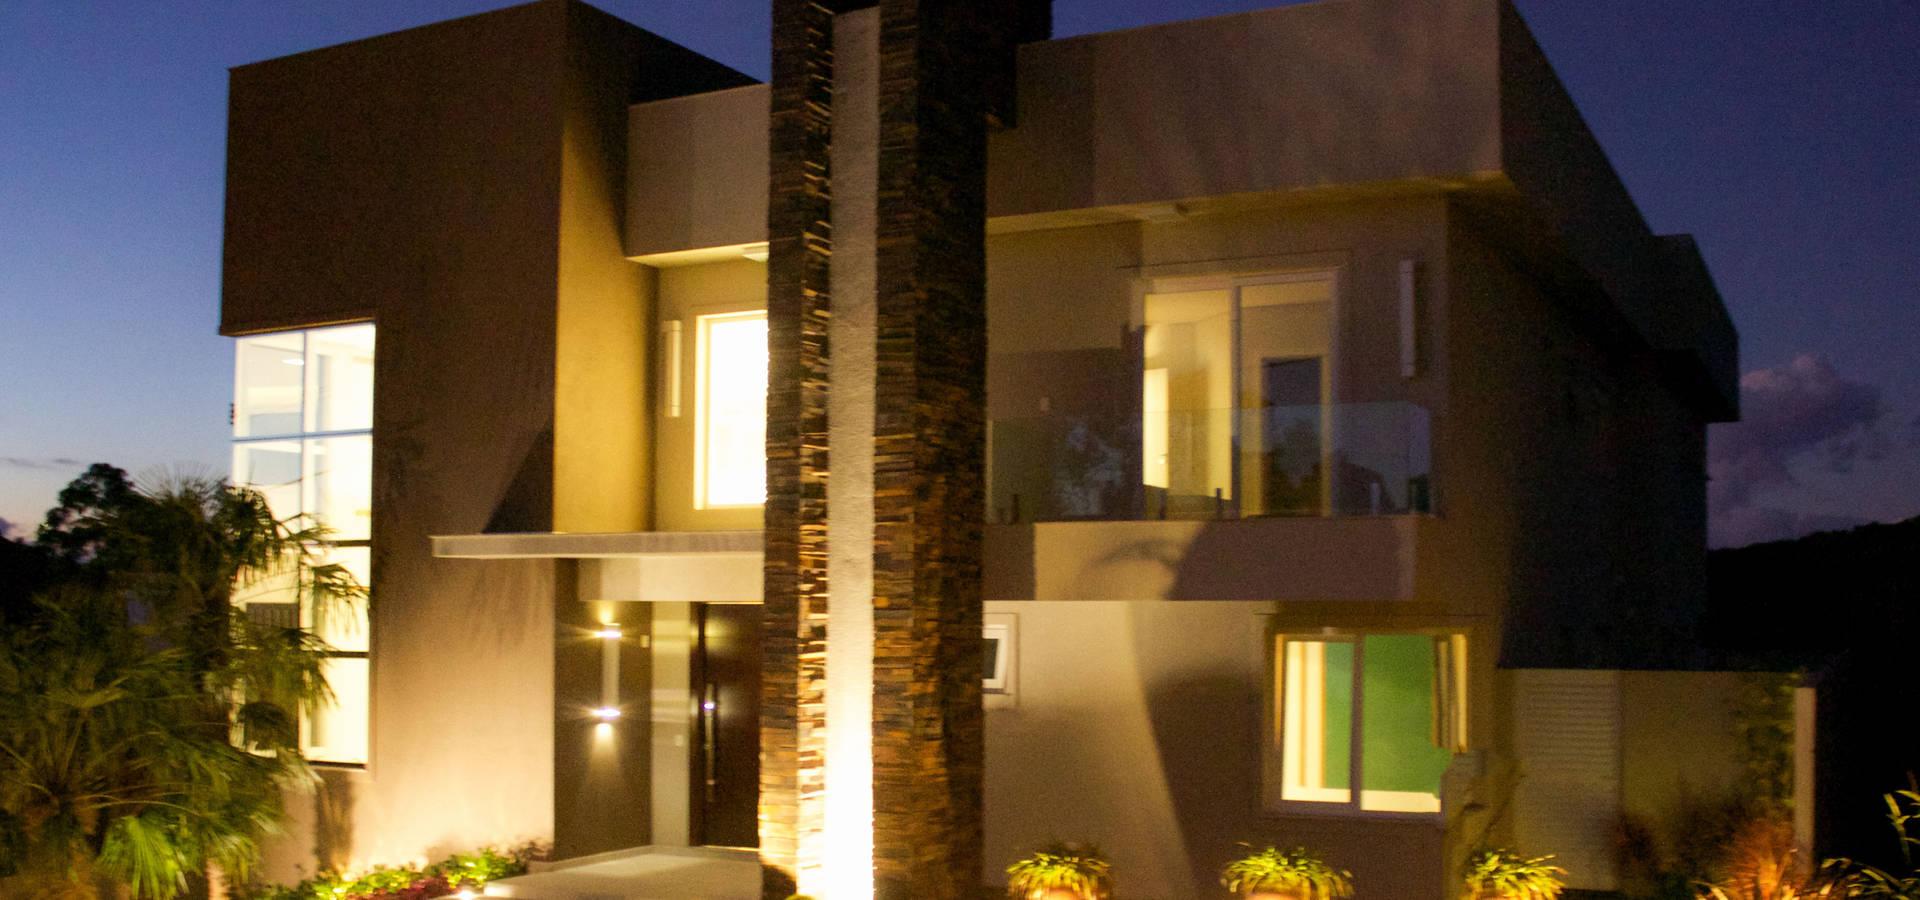 RBD Arquitetura Ltda